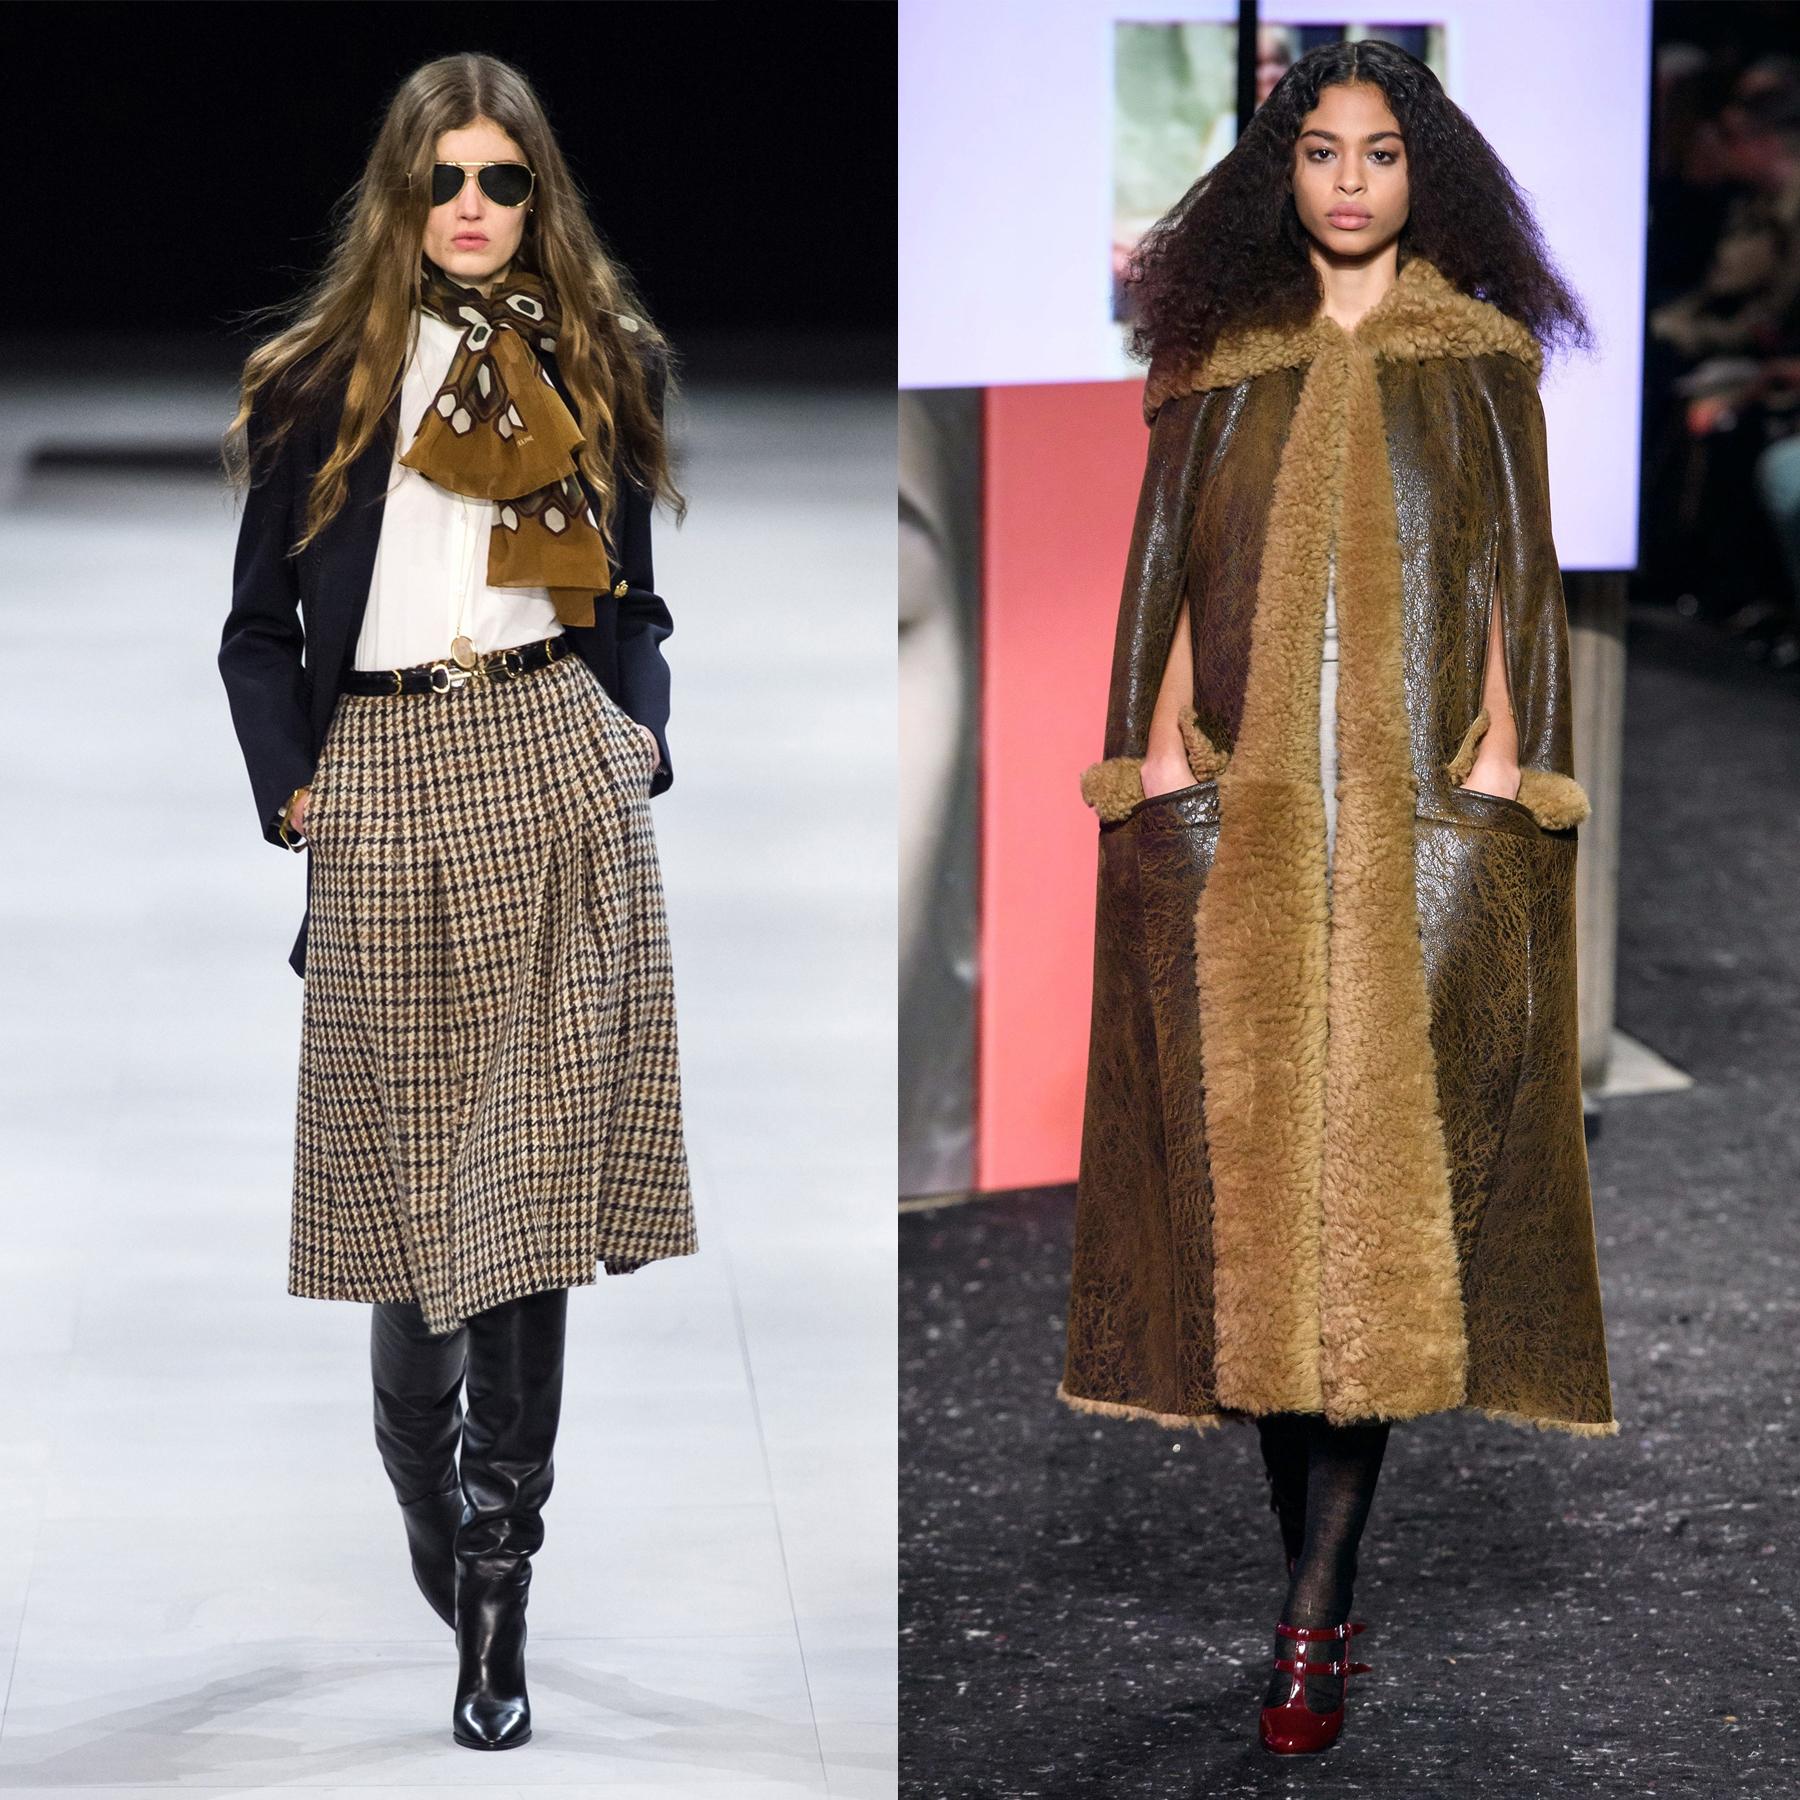 Style bourgeoise & cape